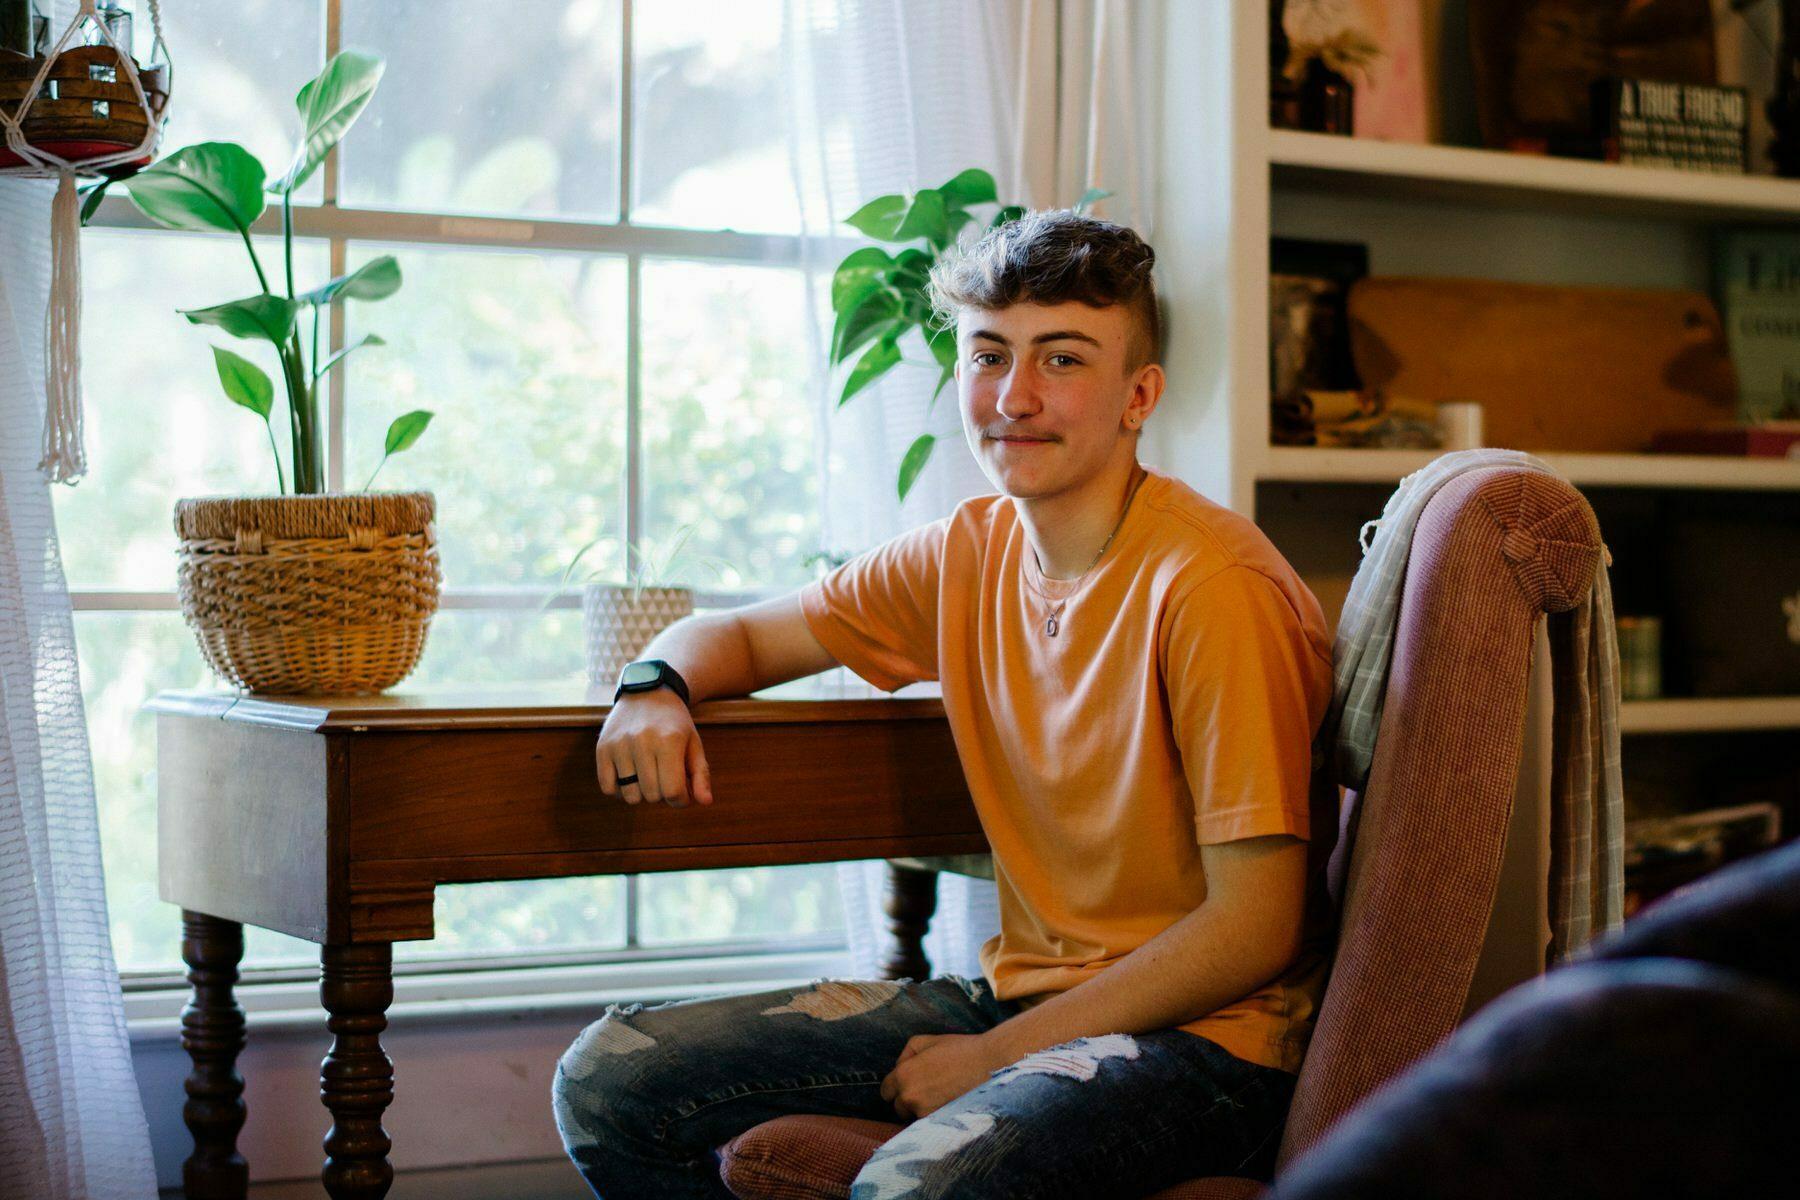 A teenage boy sits at his desk.